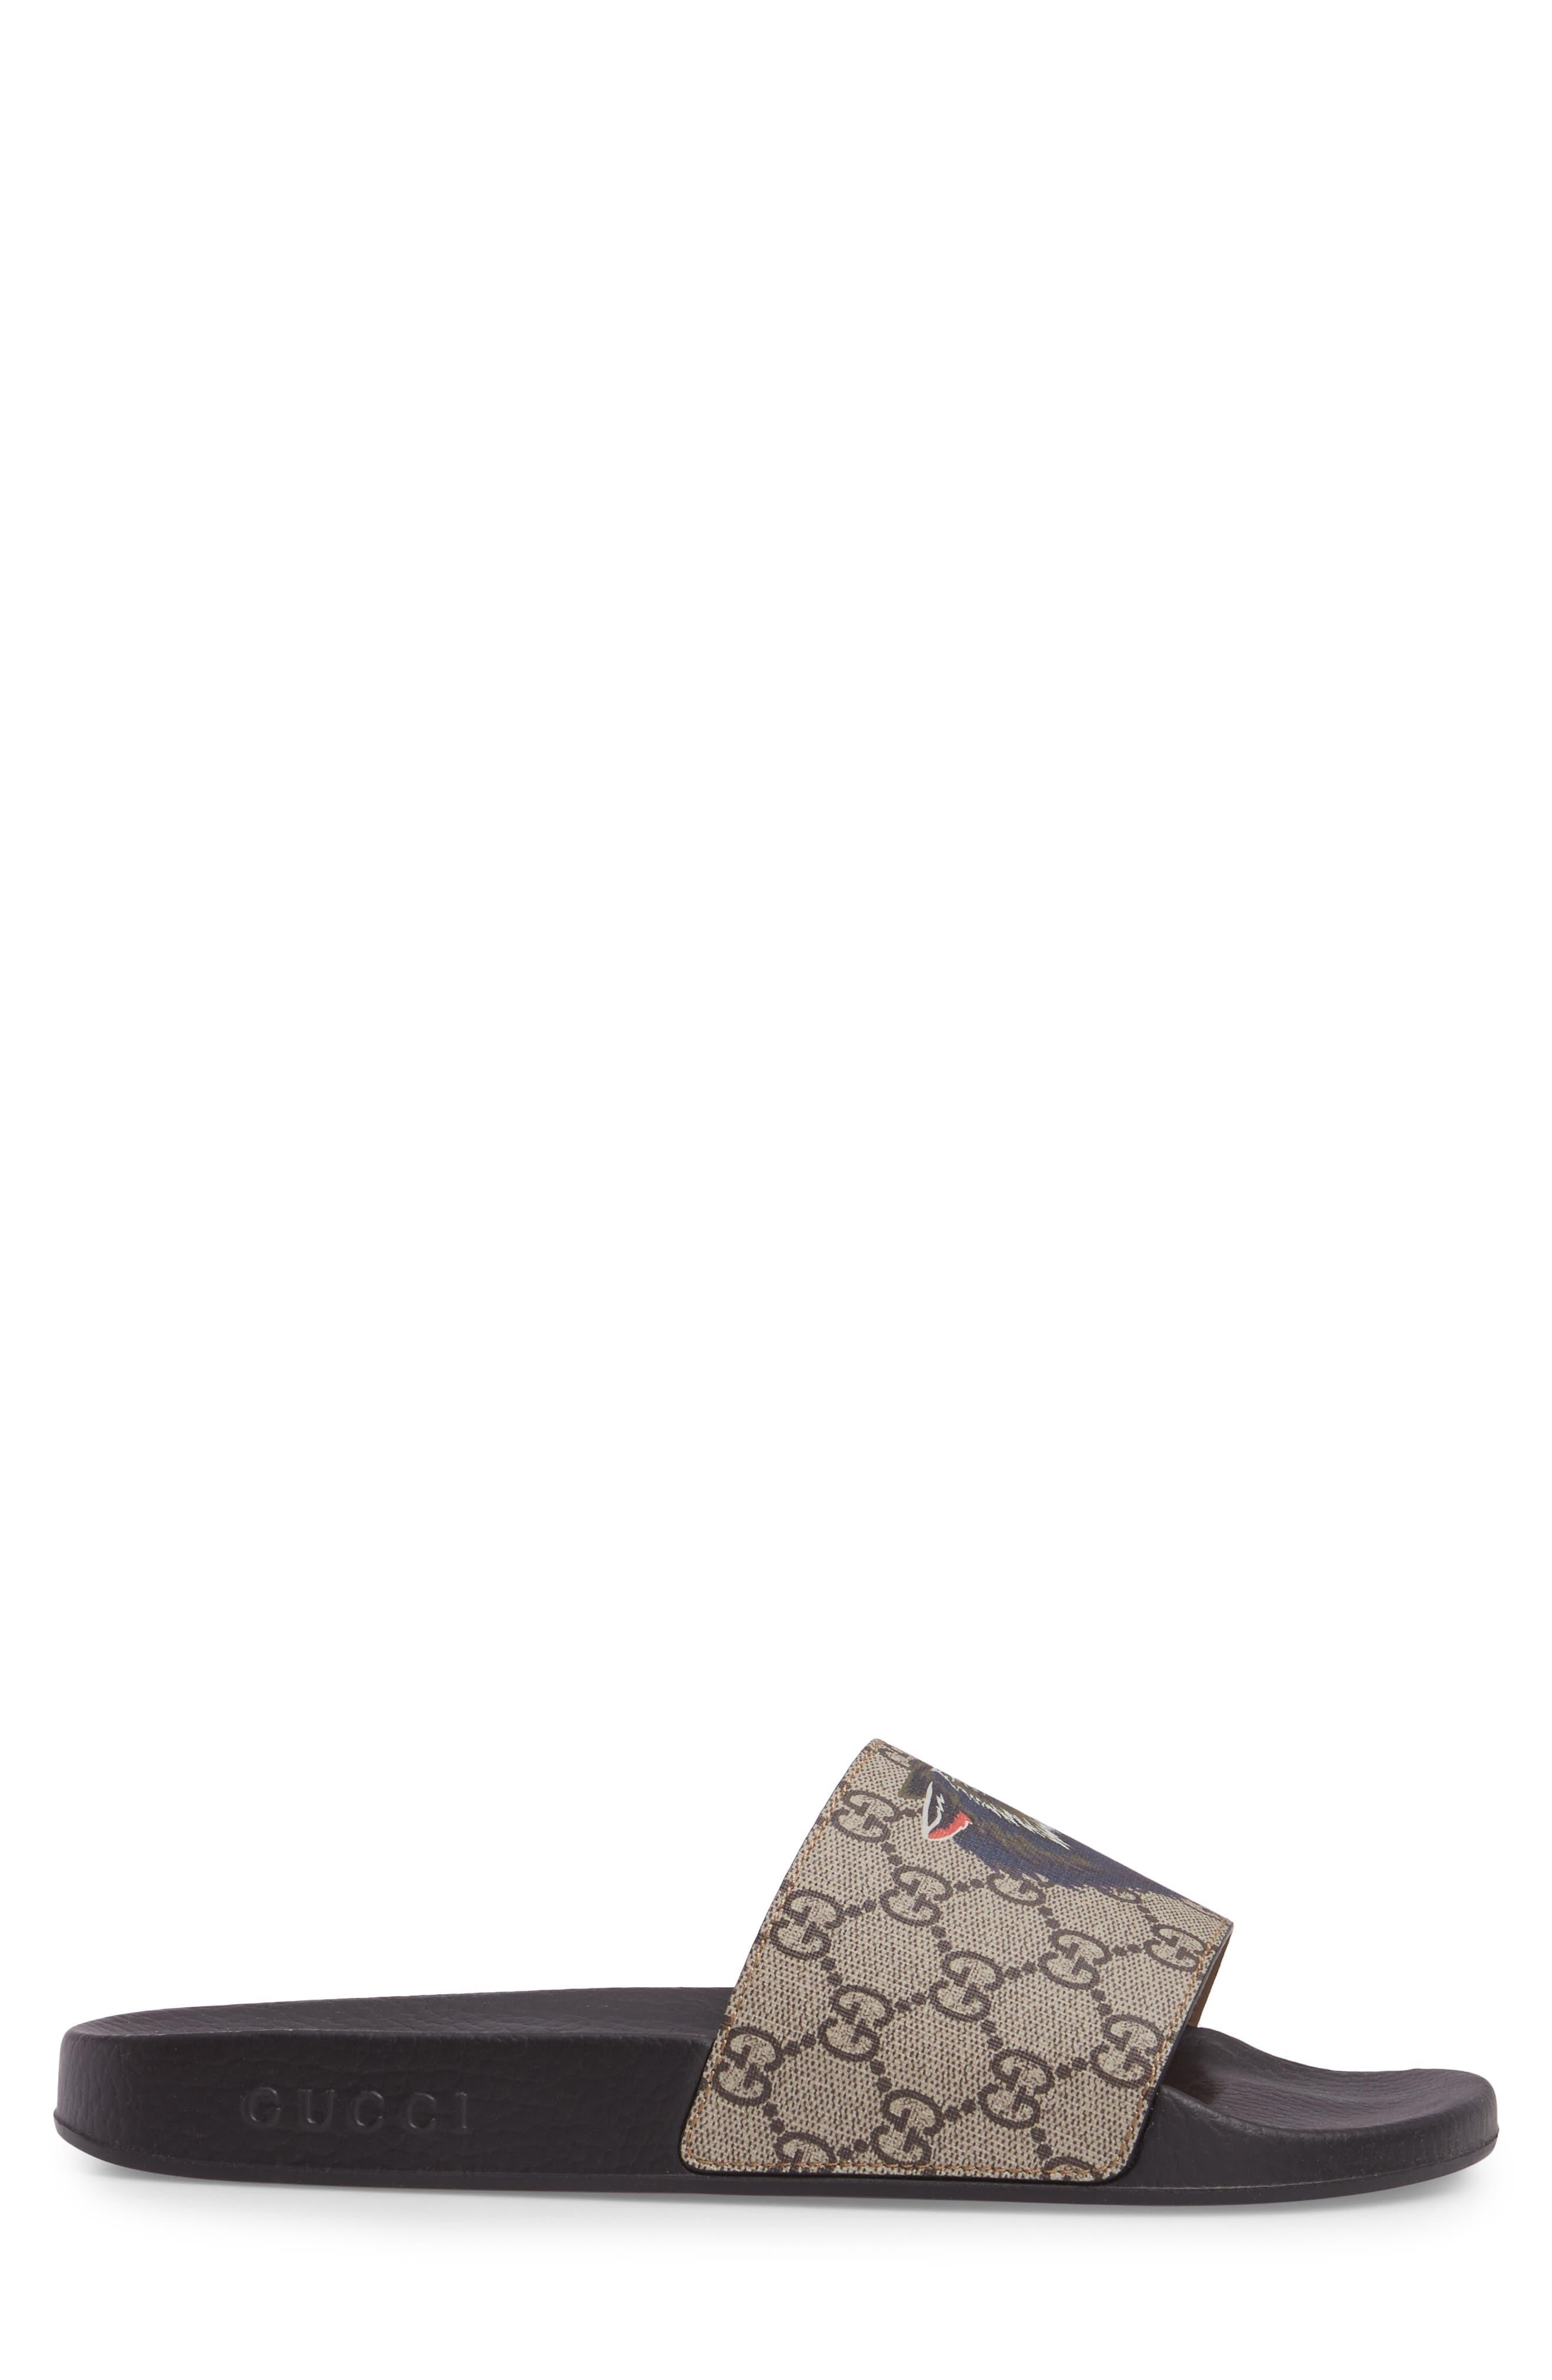 Pursuit Angry Wolf Slide Sandal,                             Alternate thumbnail 3, color,                             Beige/ Ebony